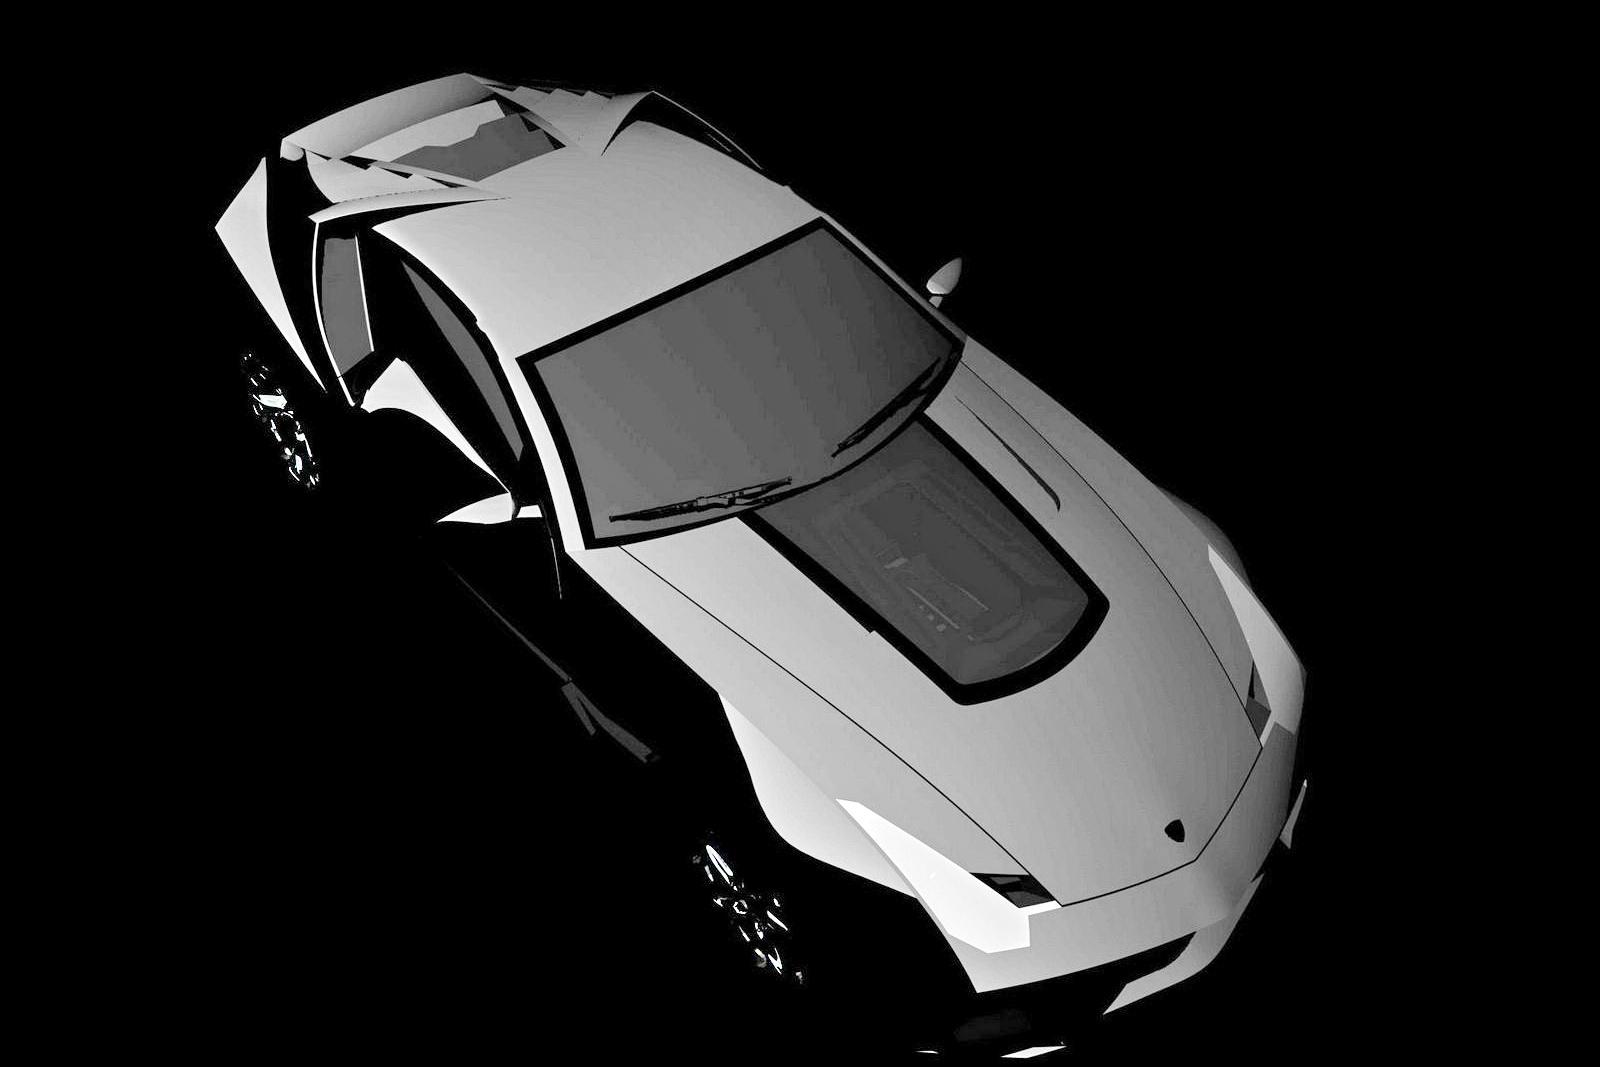 Lamborghini Toro La690 4 Yostuffs Com